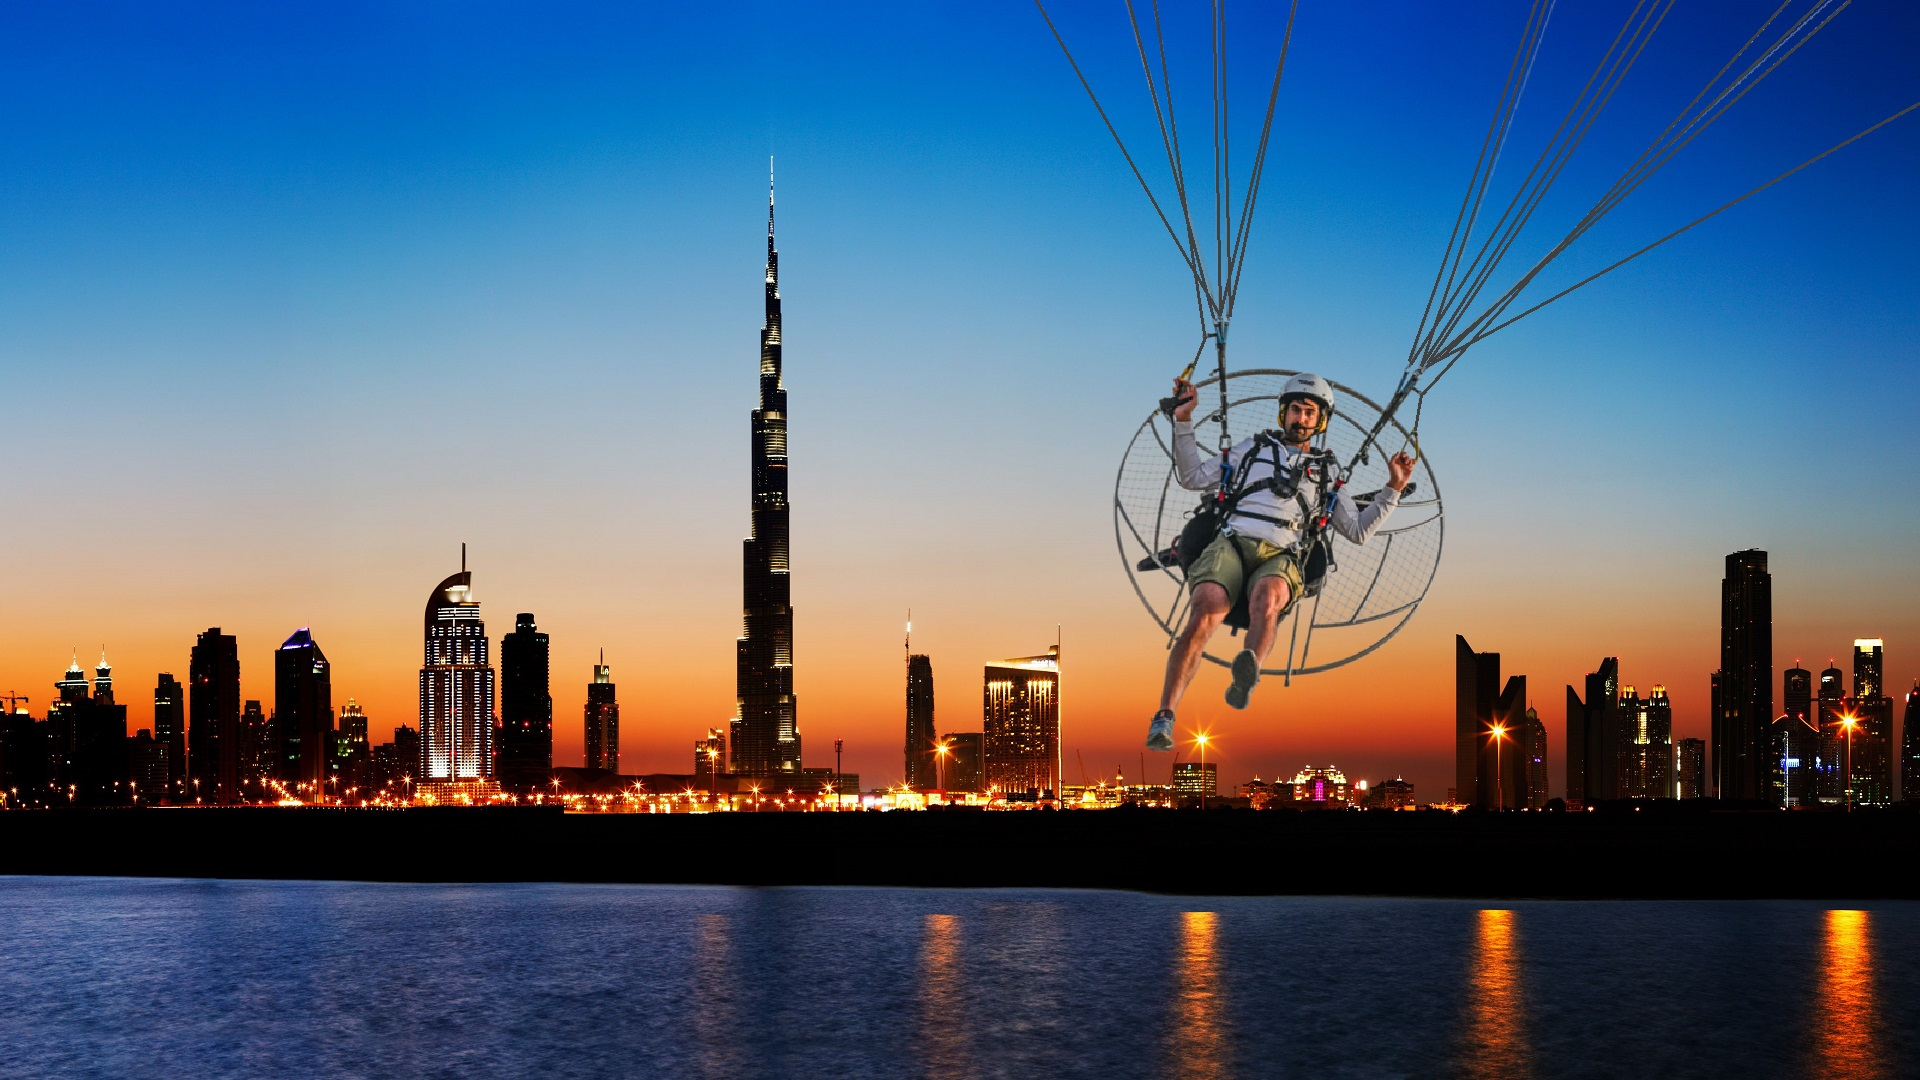 Guy in Dubai - Season 1